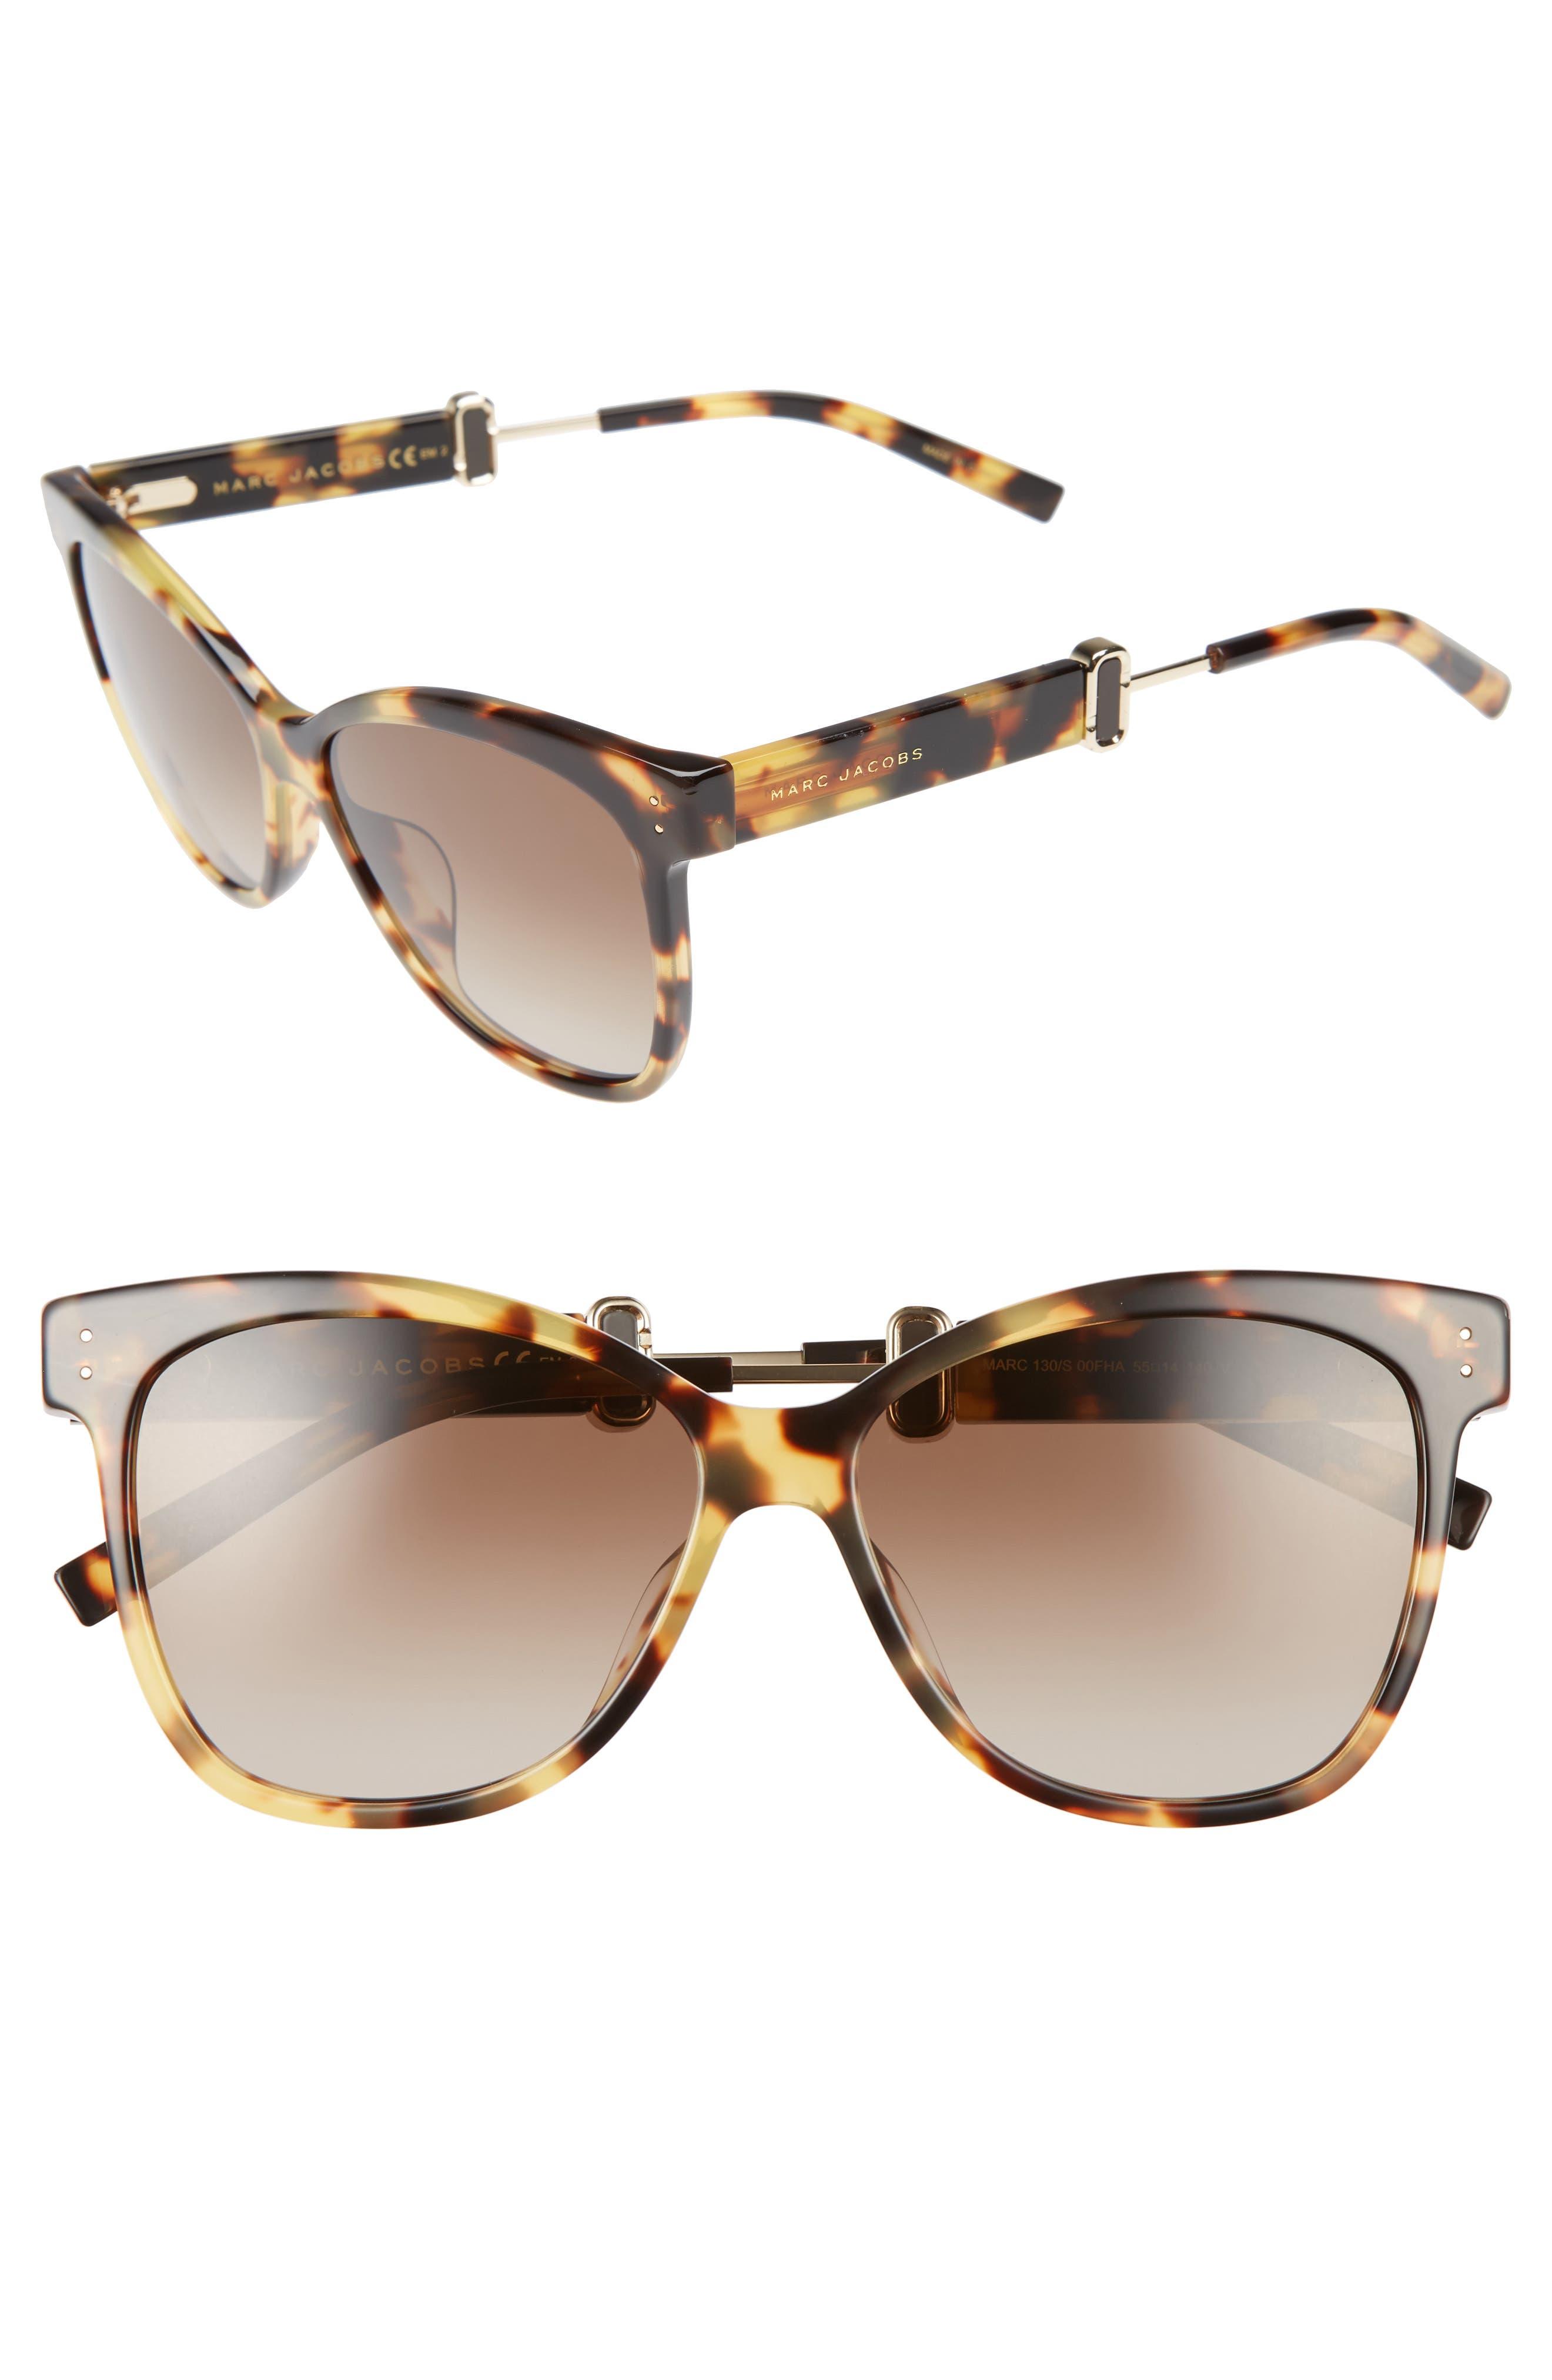 55mm Sunglasses,                             Alternate thumbnail 6, color,